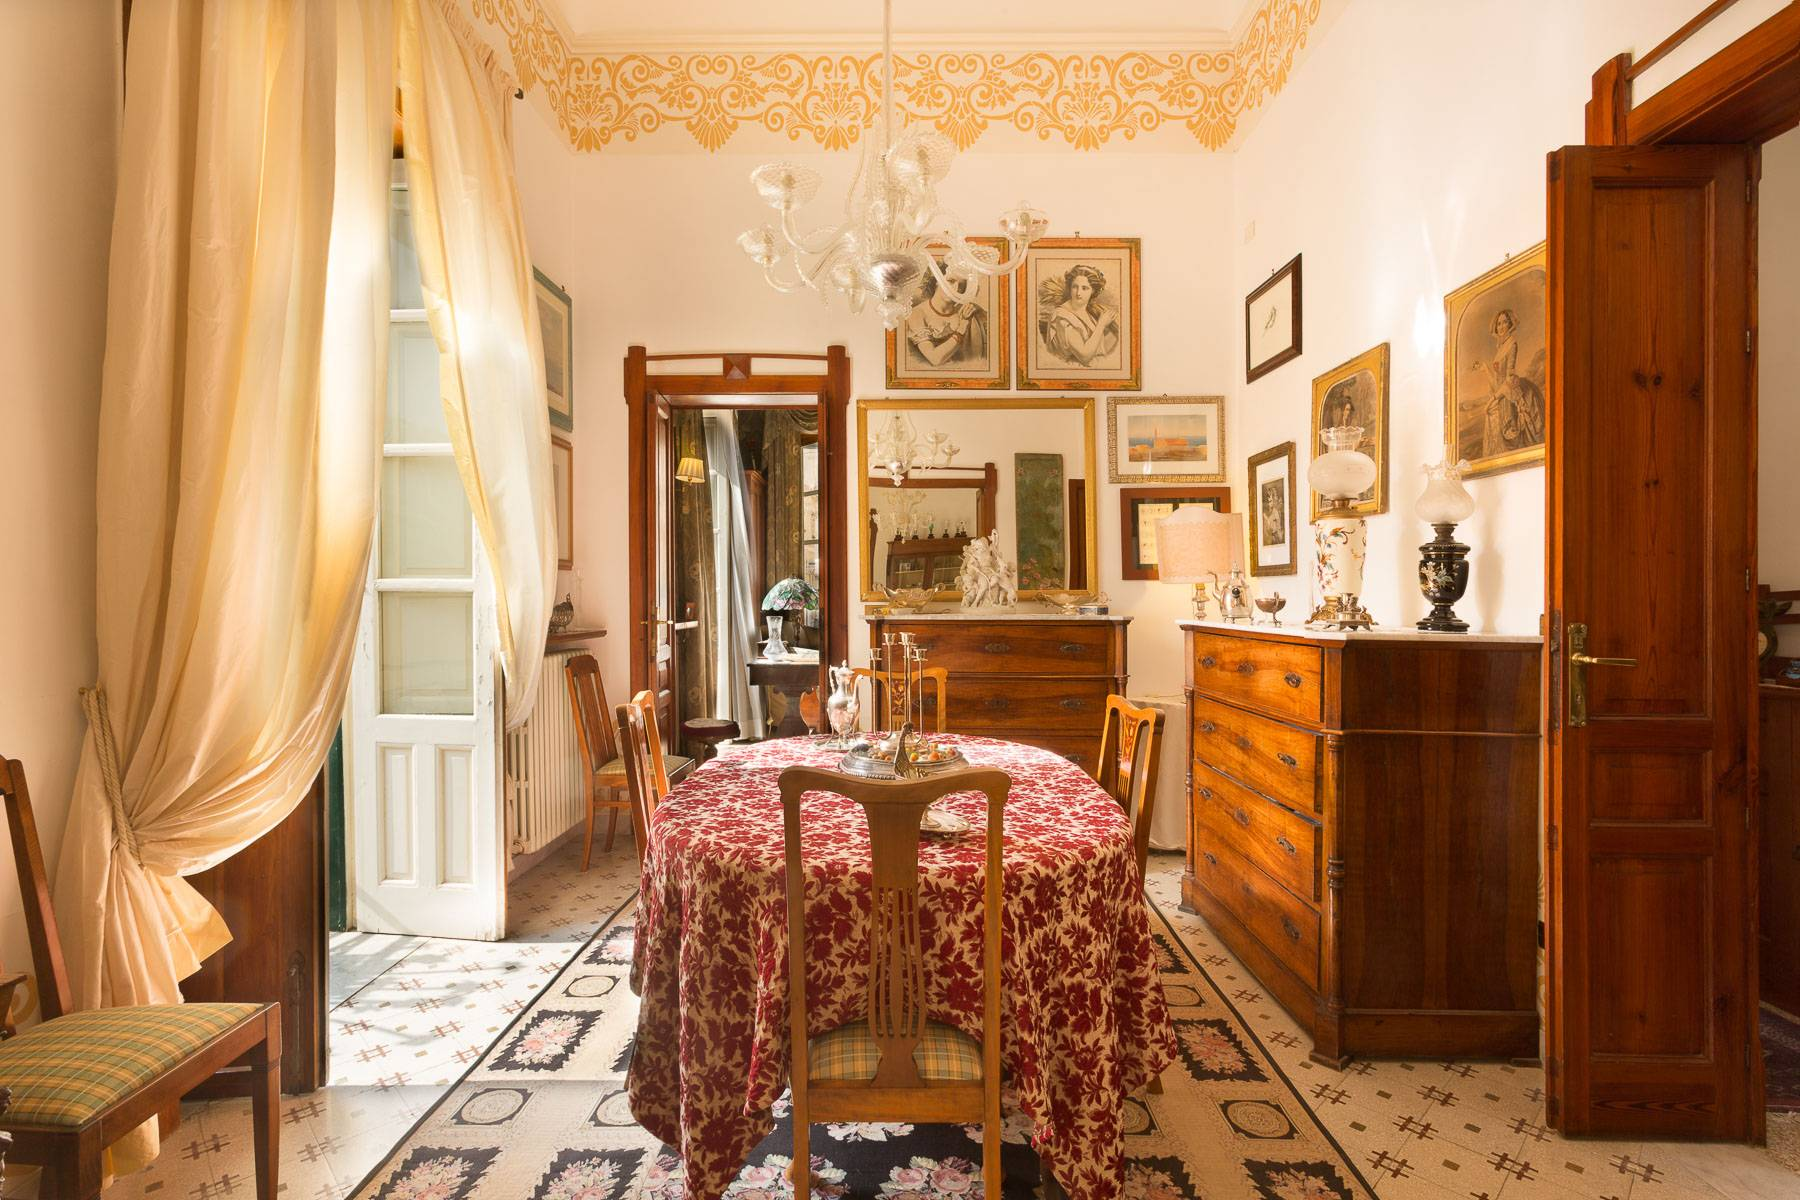 Casa indipendente in Vendita a Noto: 5 locali, 280 mq - Foto 14